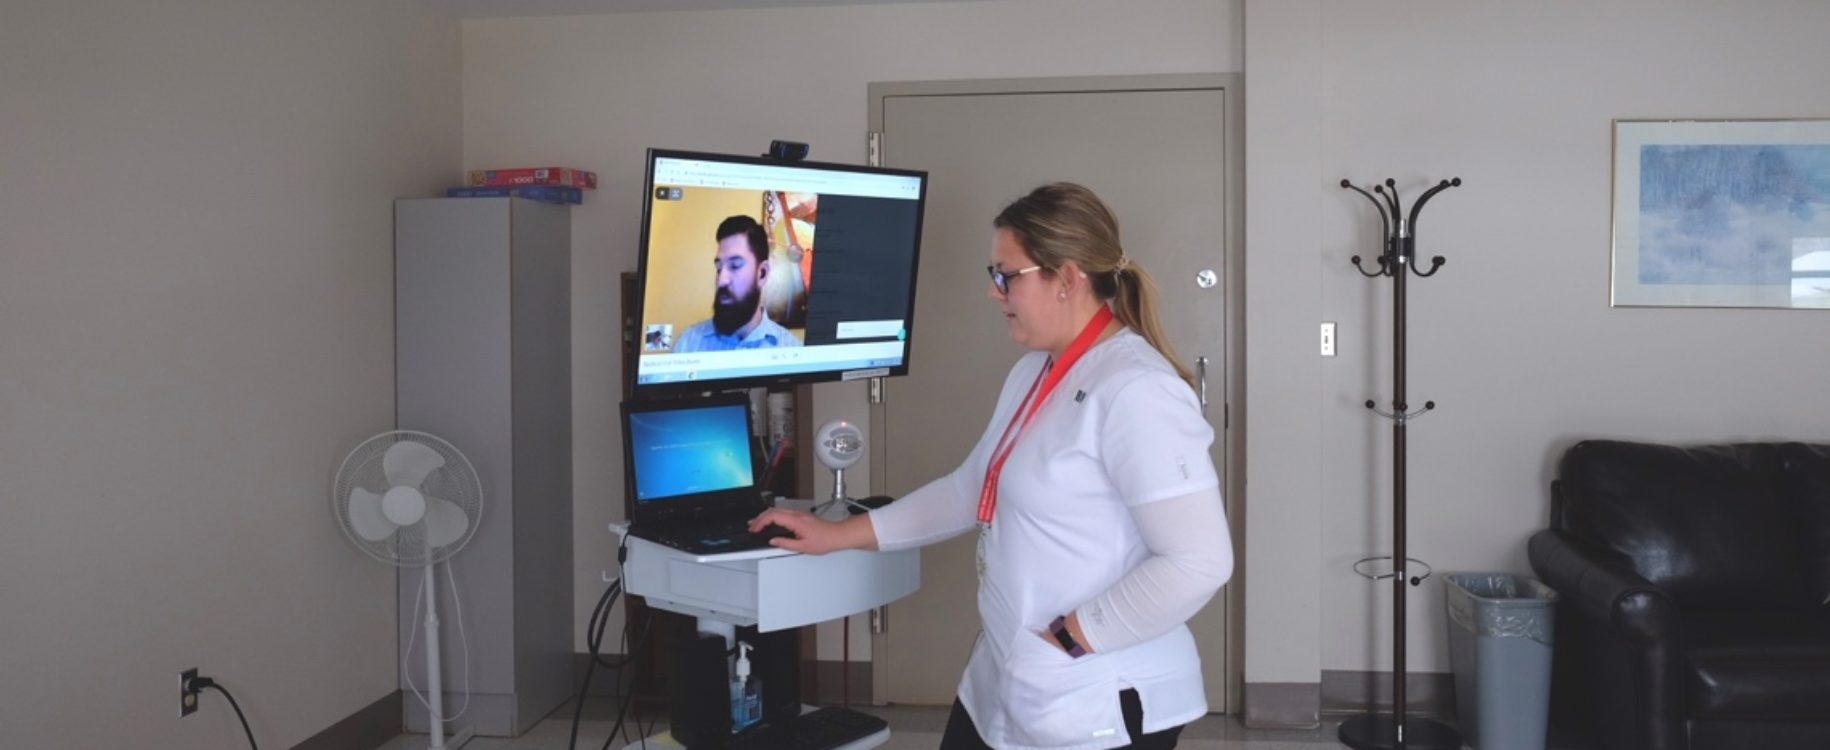 "P.E.I. hospital tackles doctor shortage through video ""tele-rounding"" pilot"